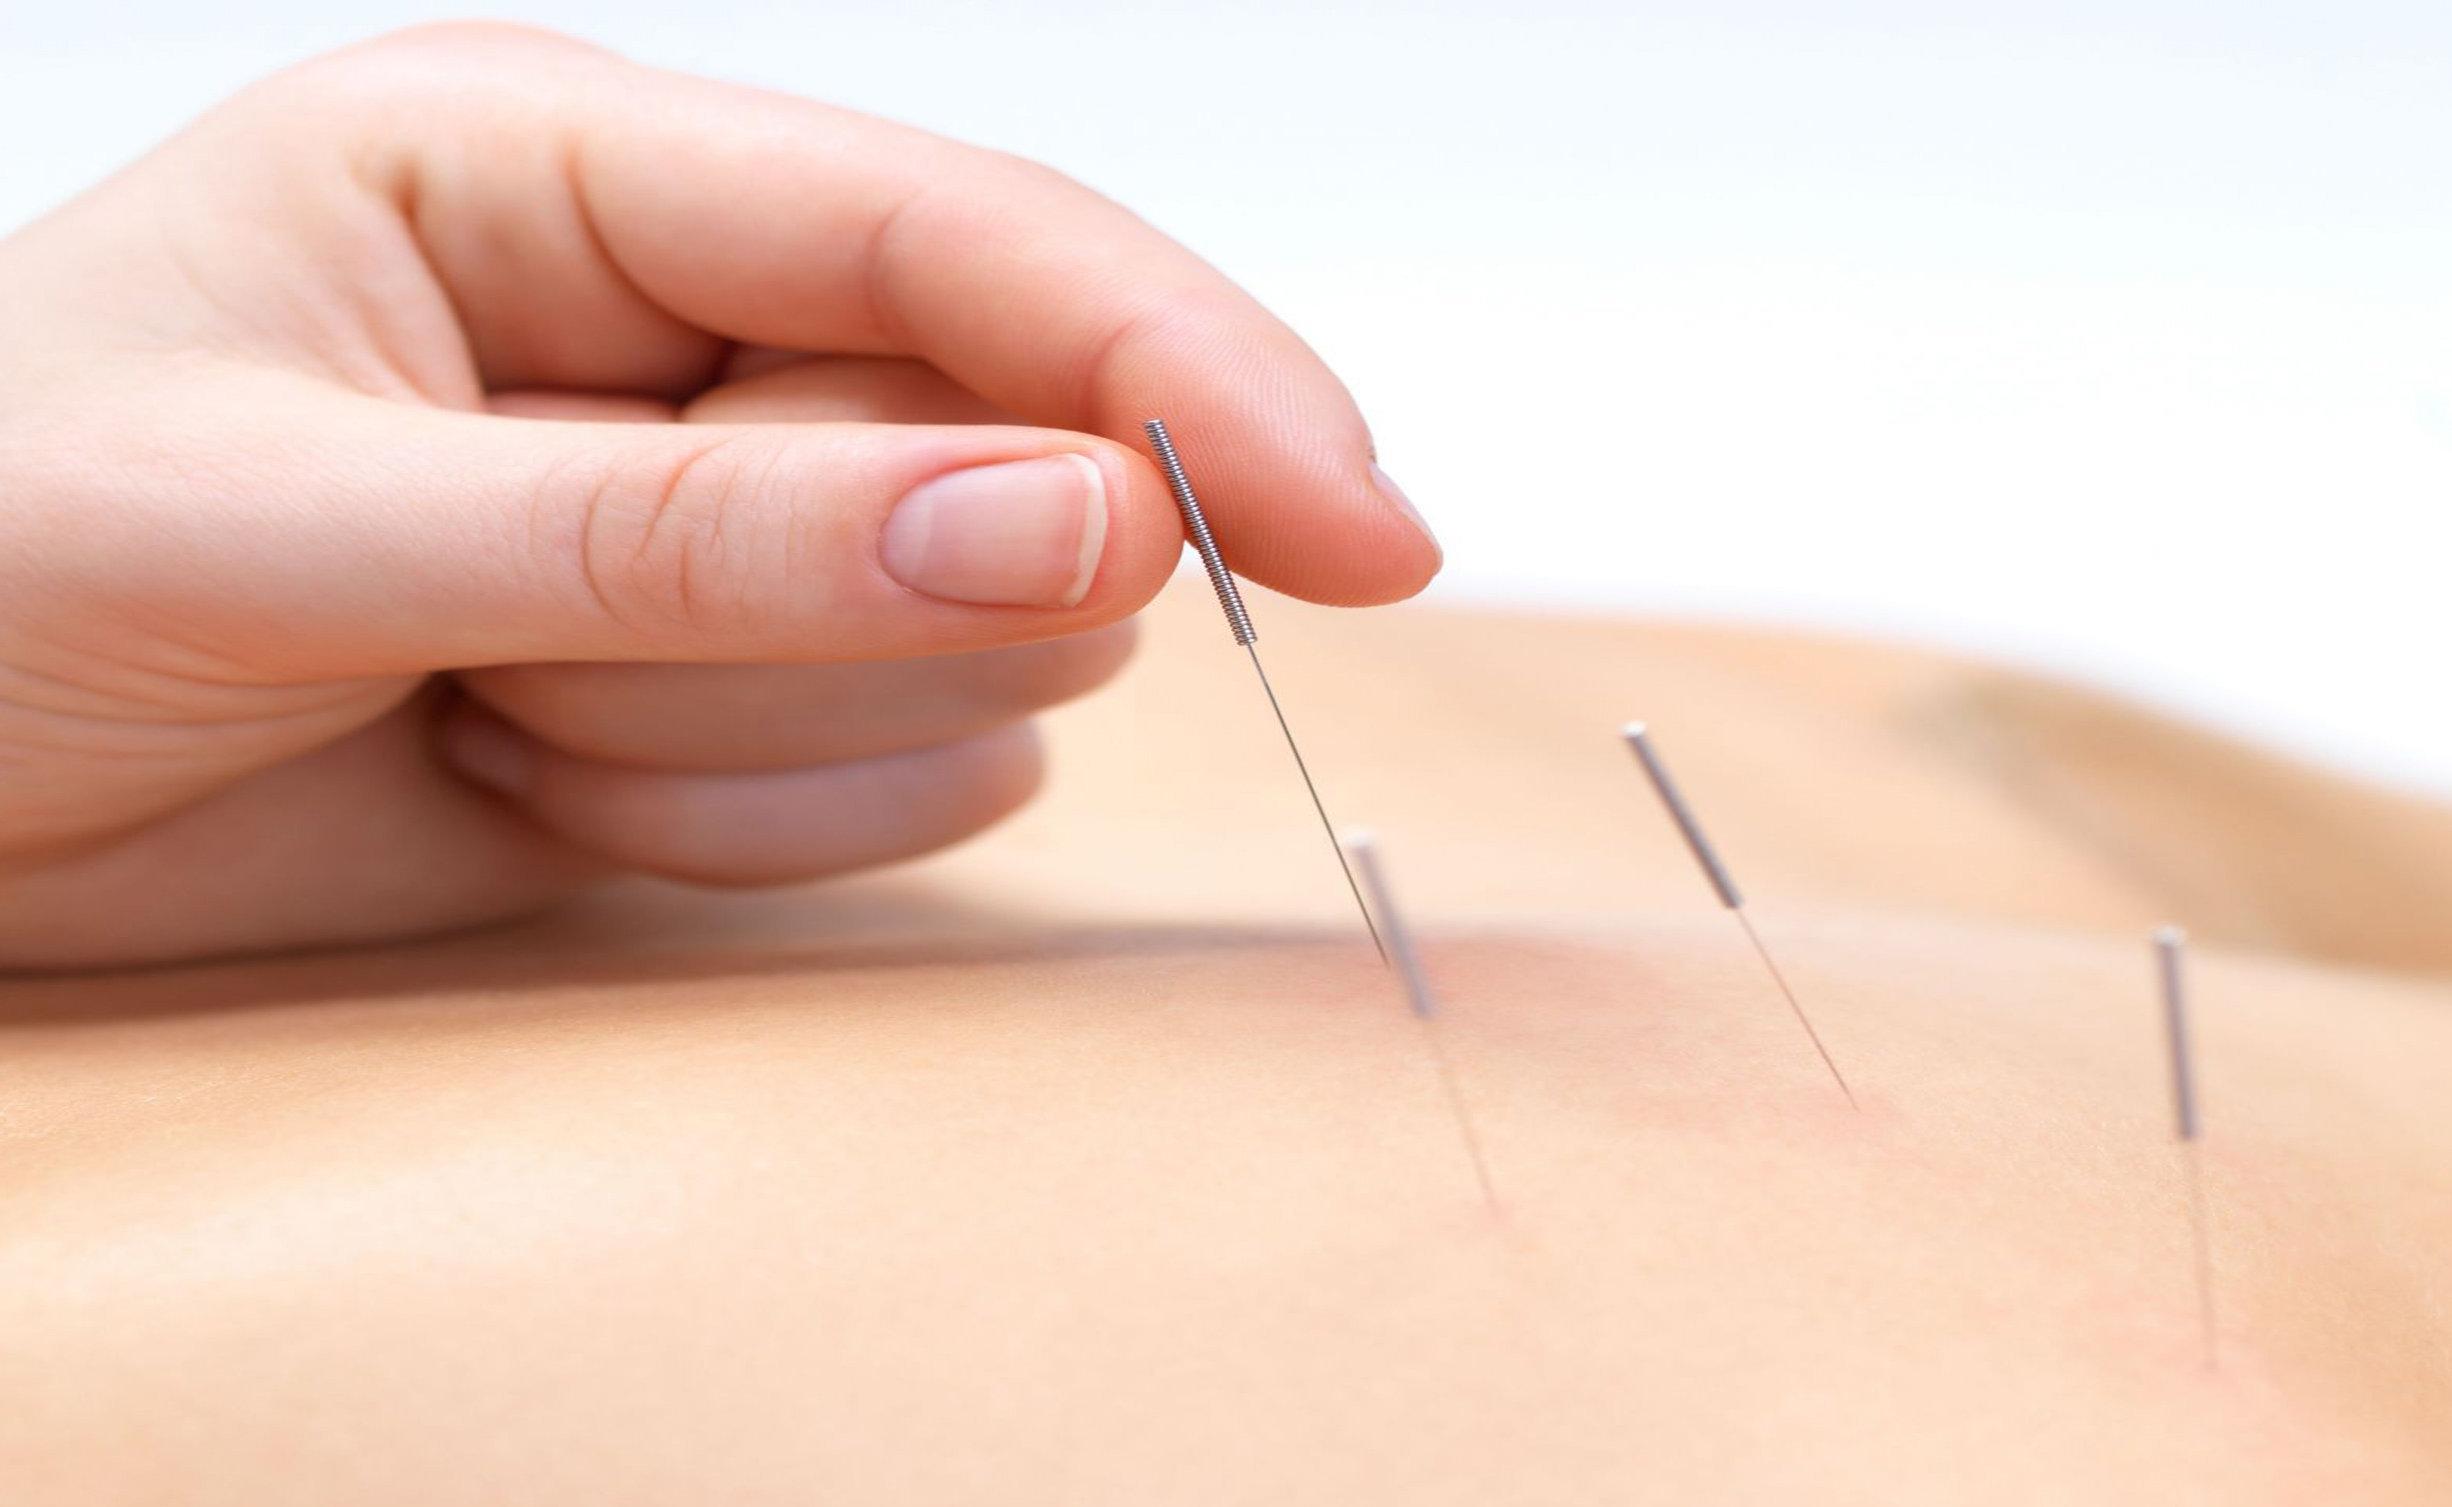 12 Cara Mengatasi Sakit Pinggang Saat Hamil Muda dan Hamil Tua